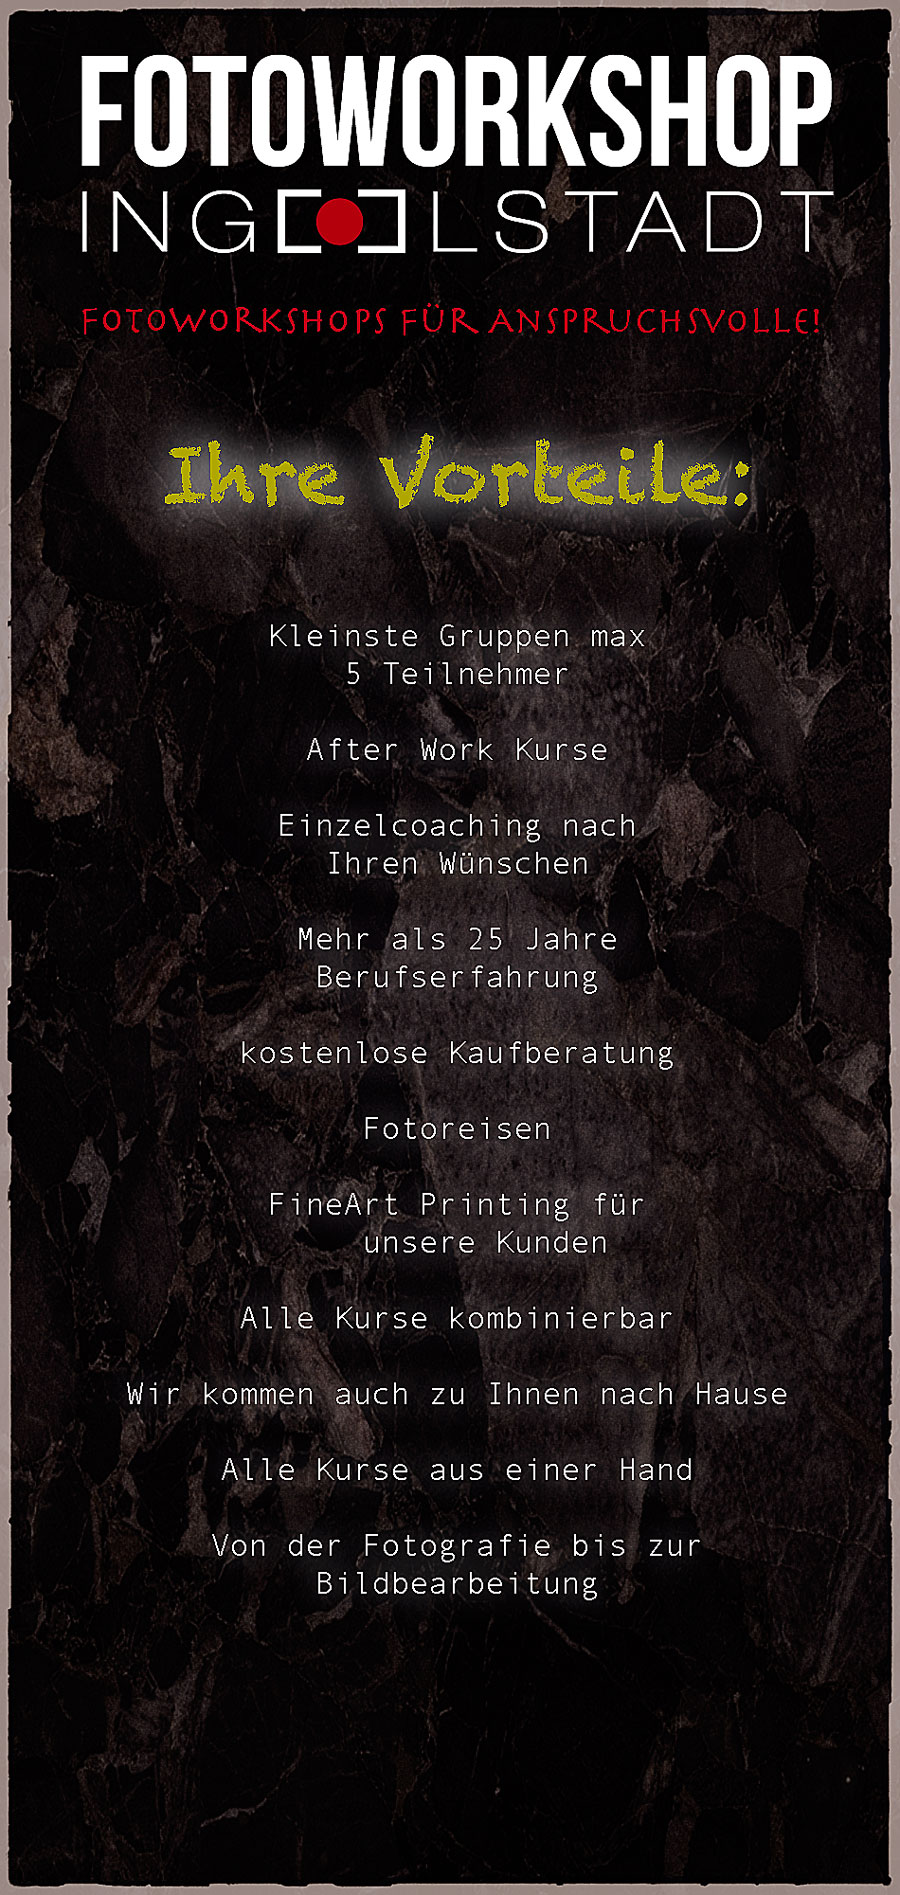 Vorteil Fotoworkshop-Ingolstadt.de